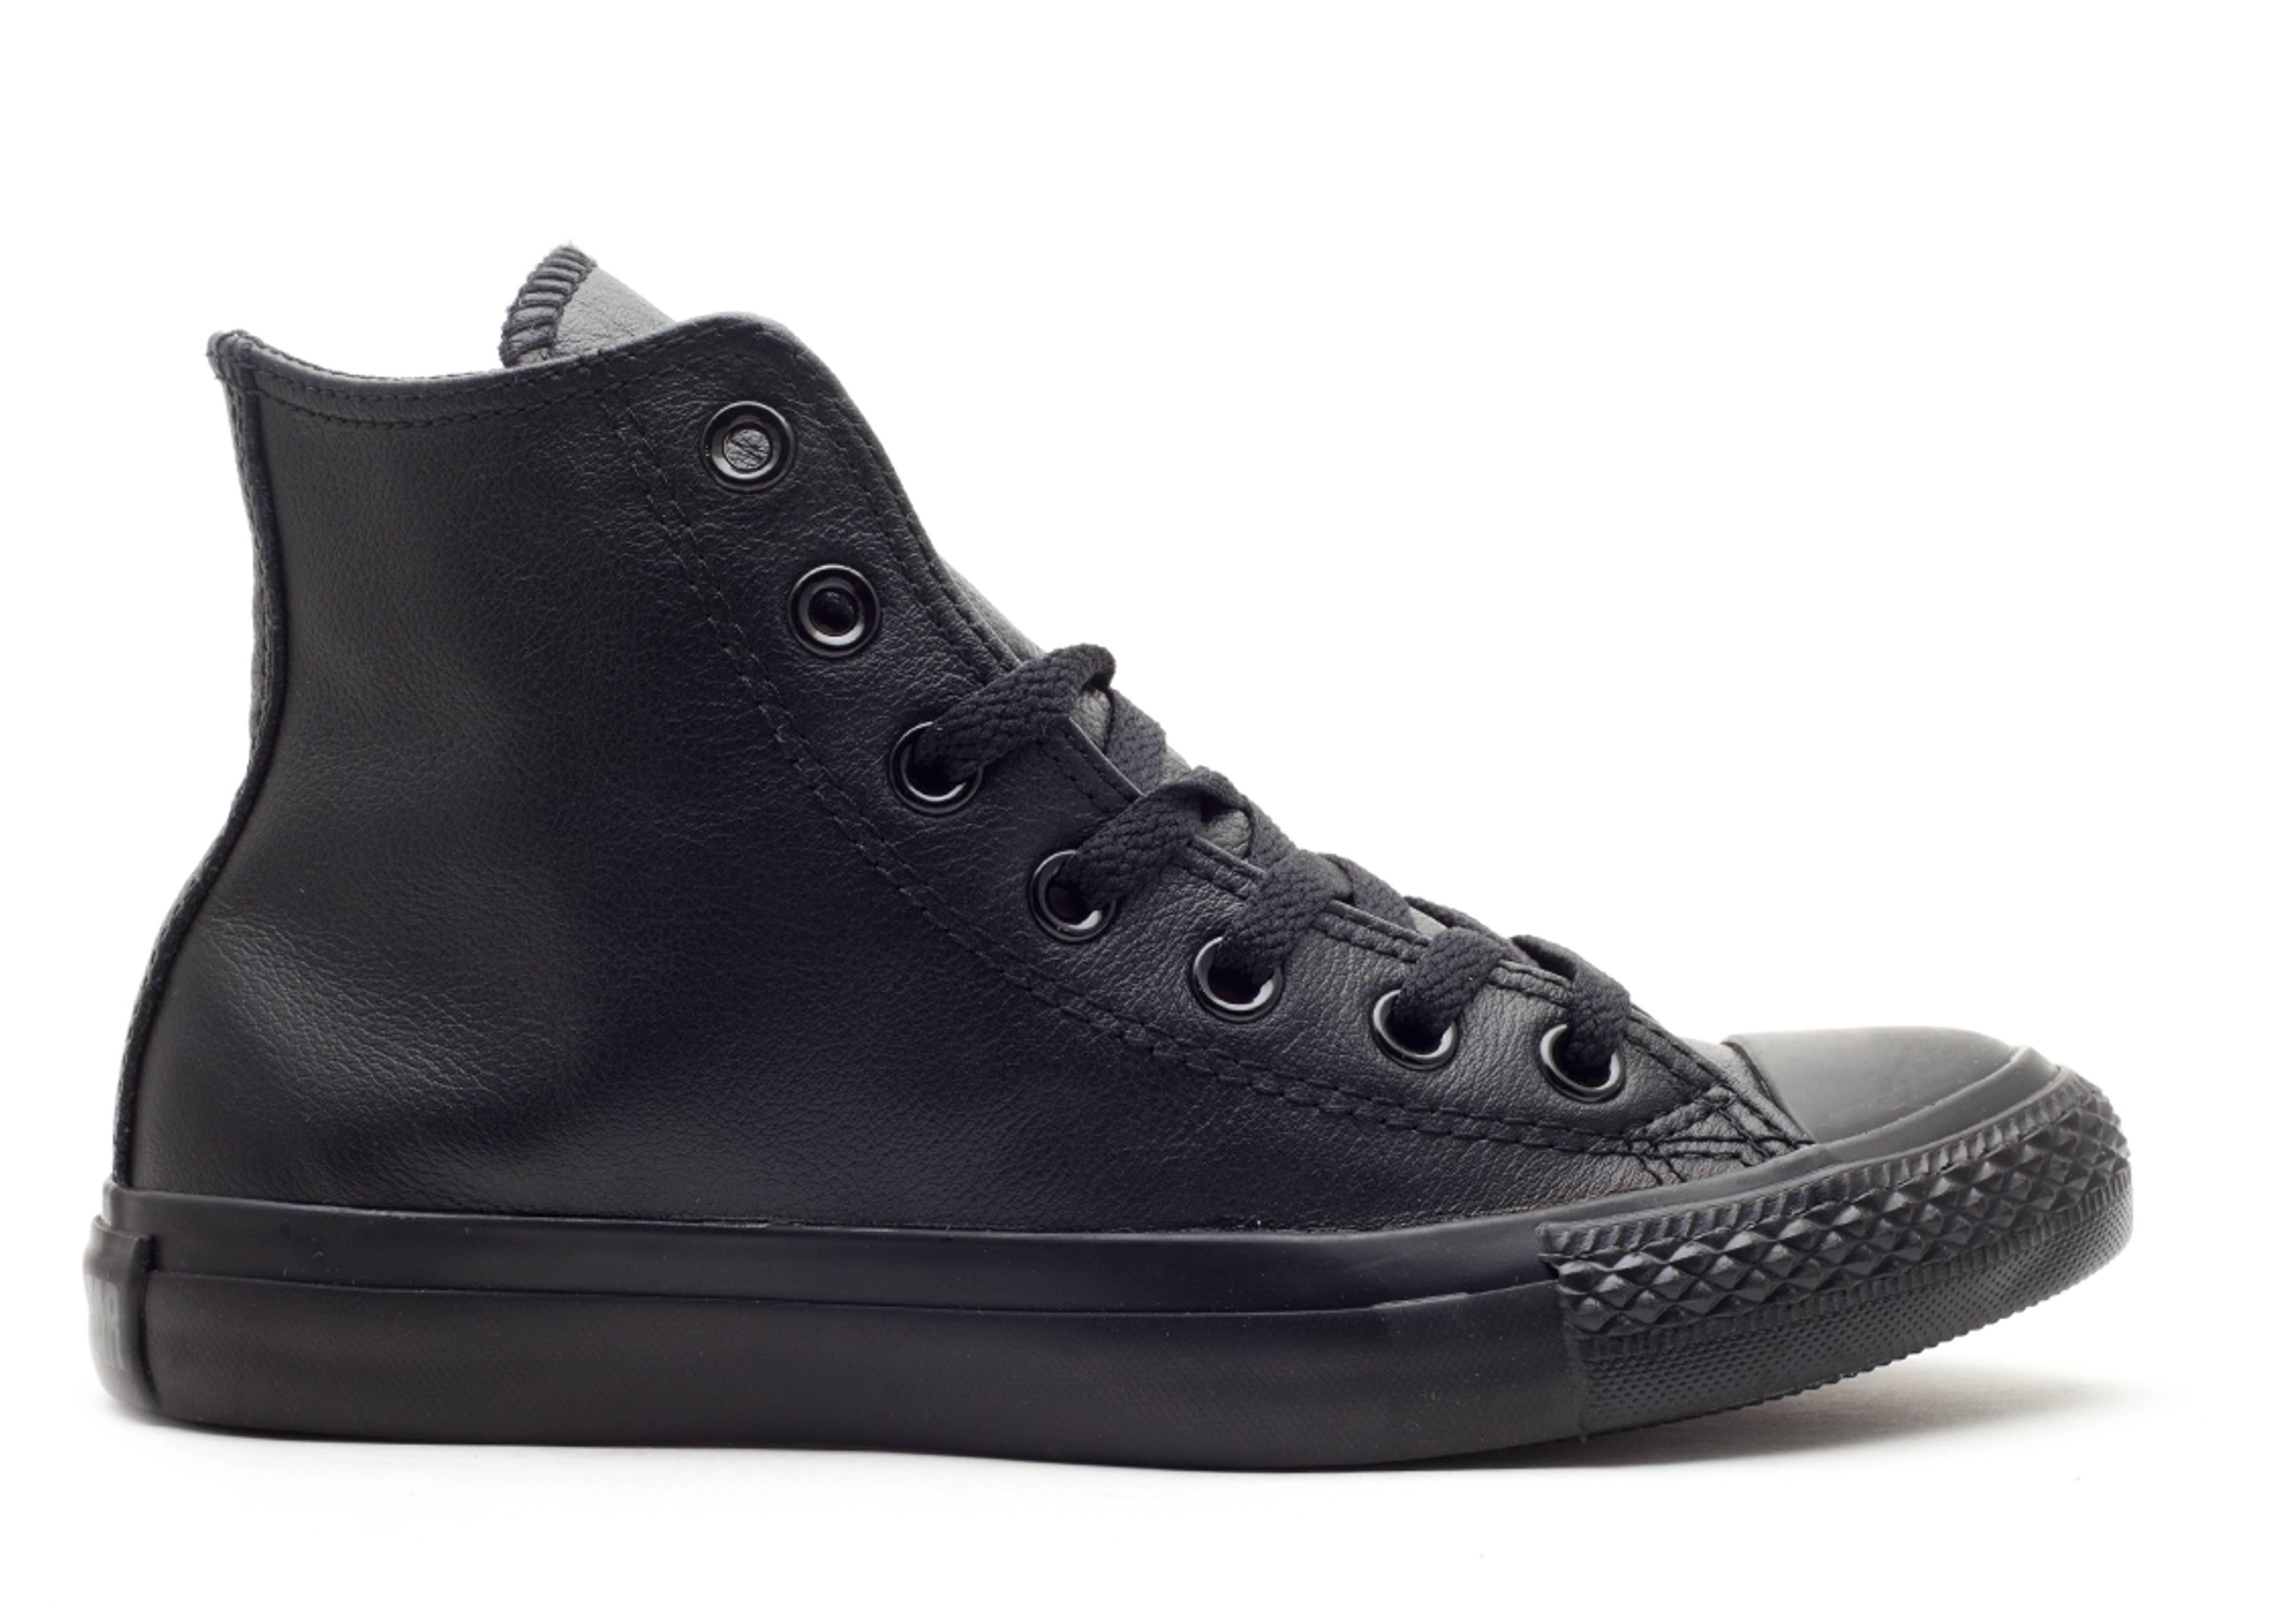 ct a/s leather hi